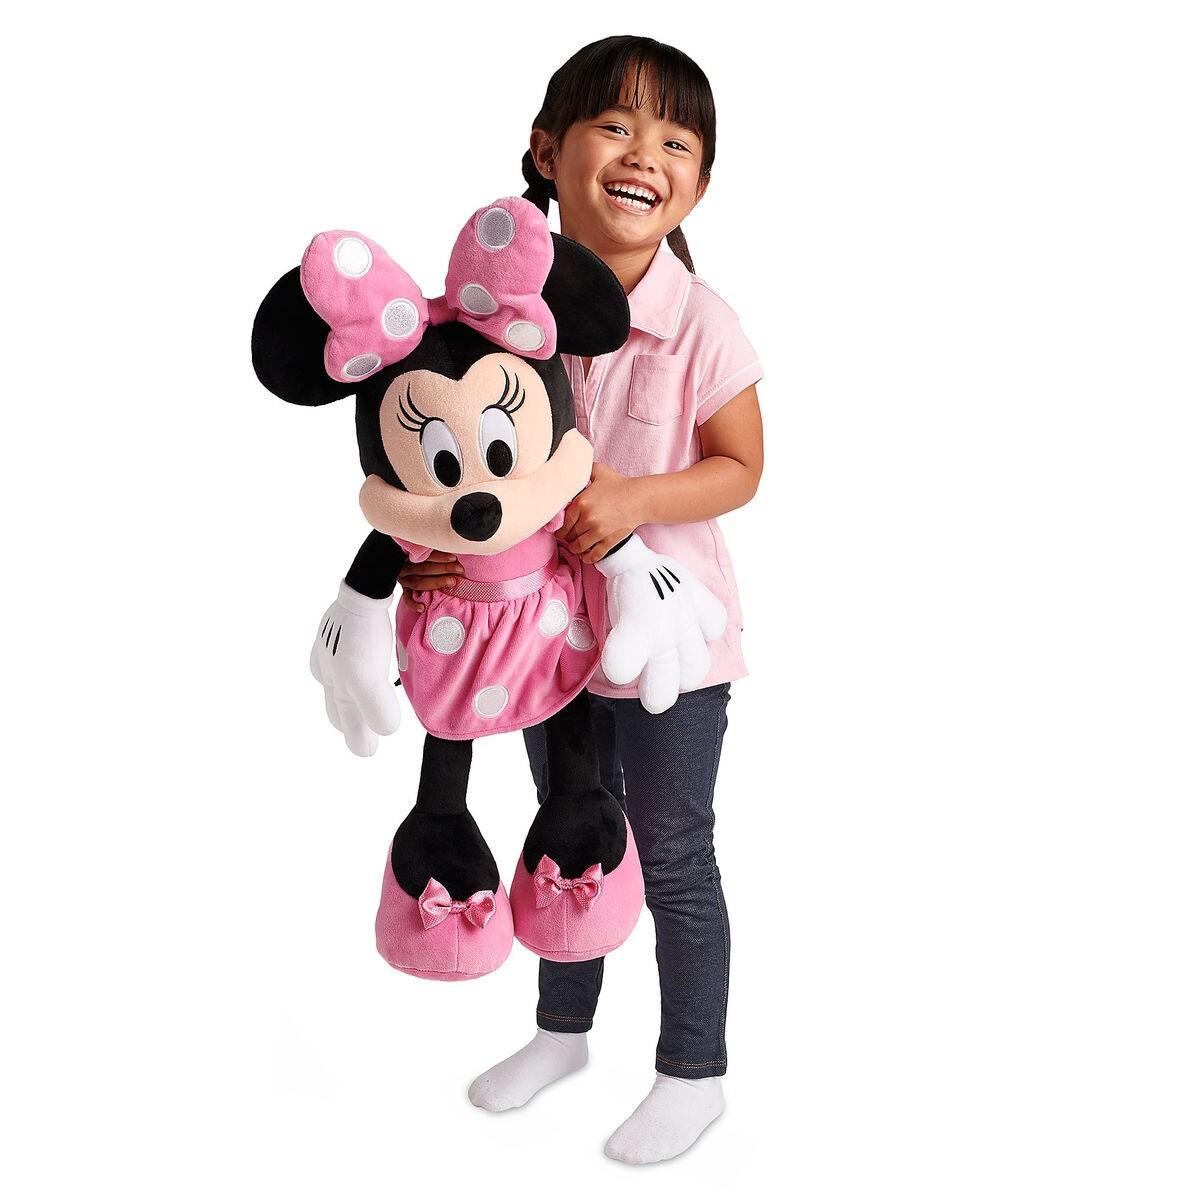 Minnie Mouse Plush Pink Large Shopdisney